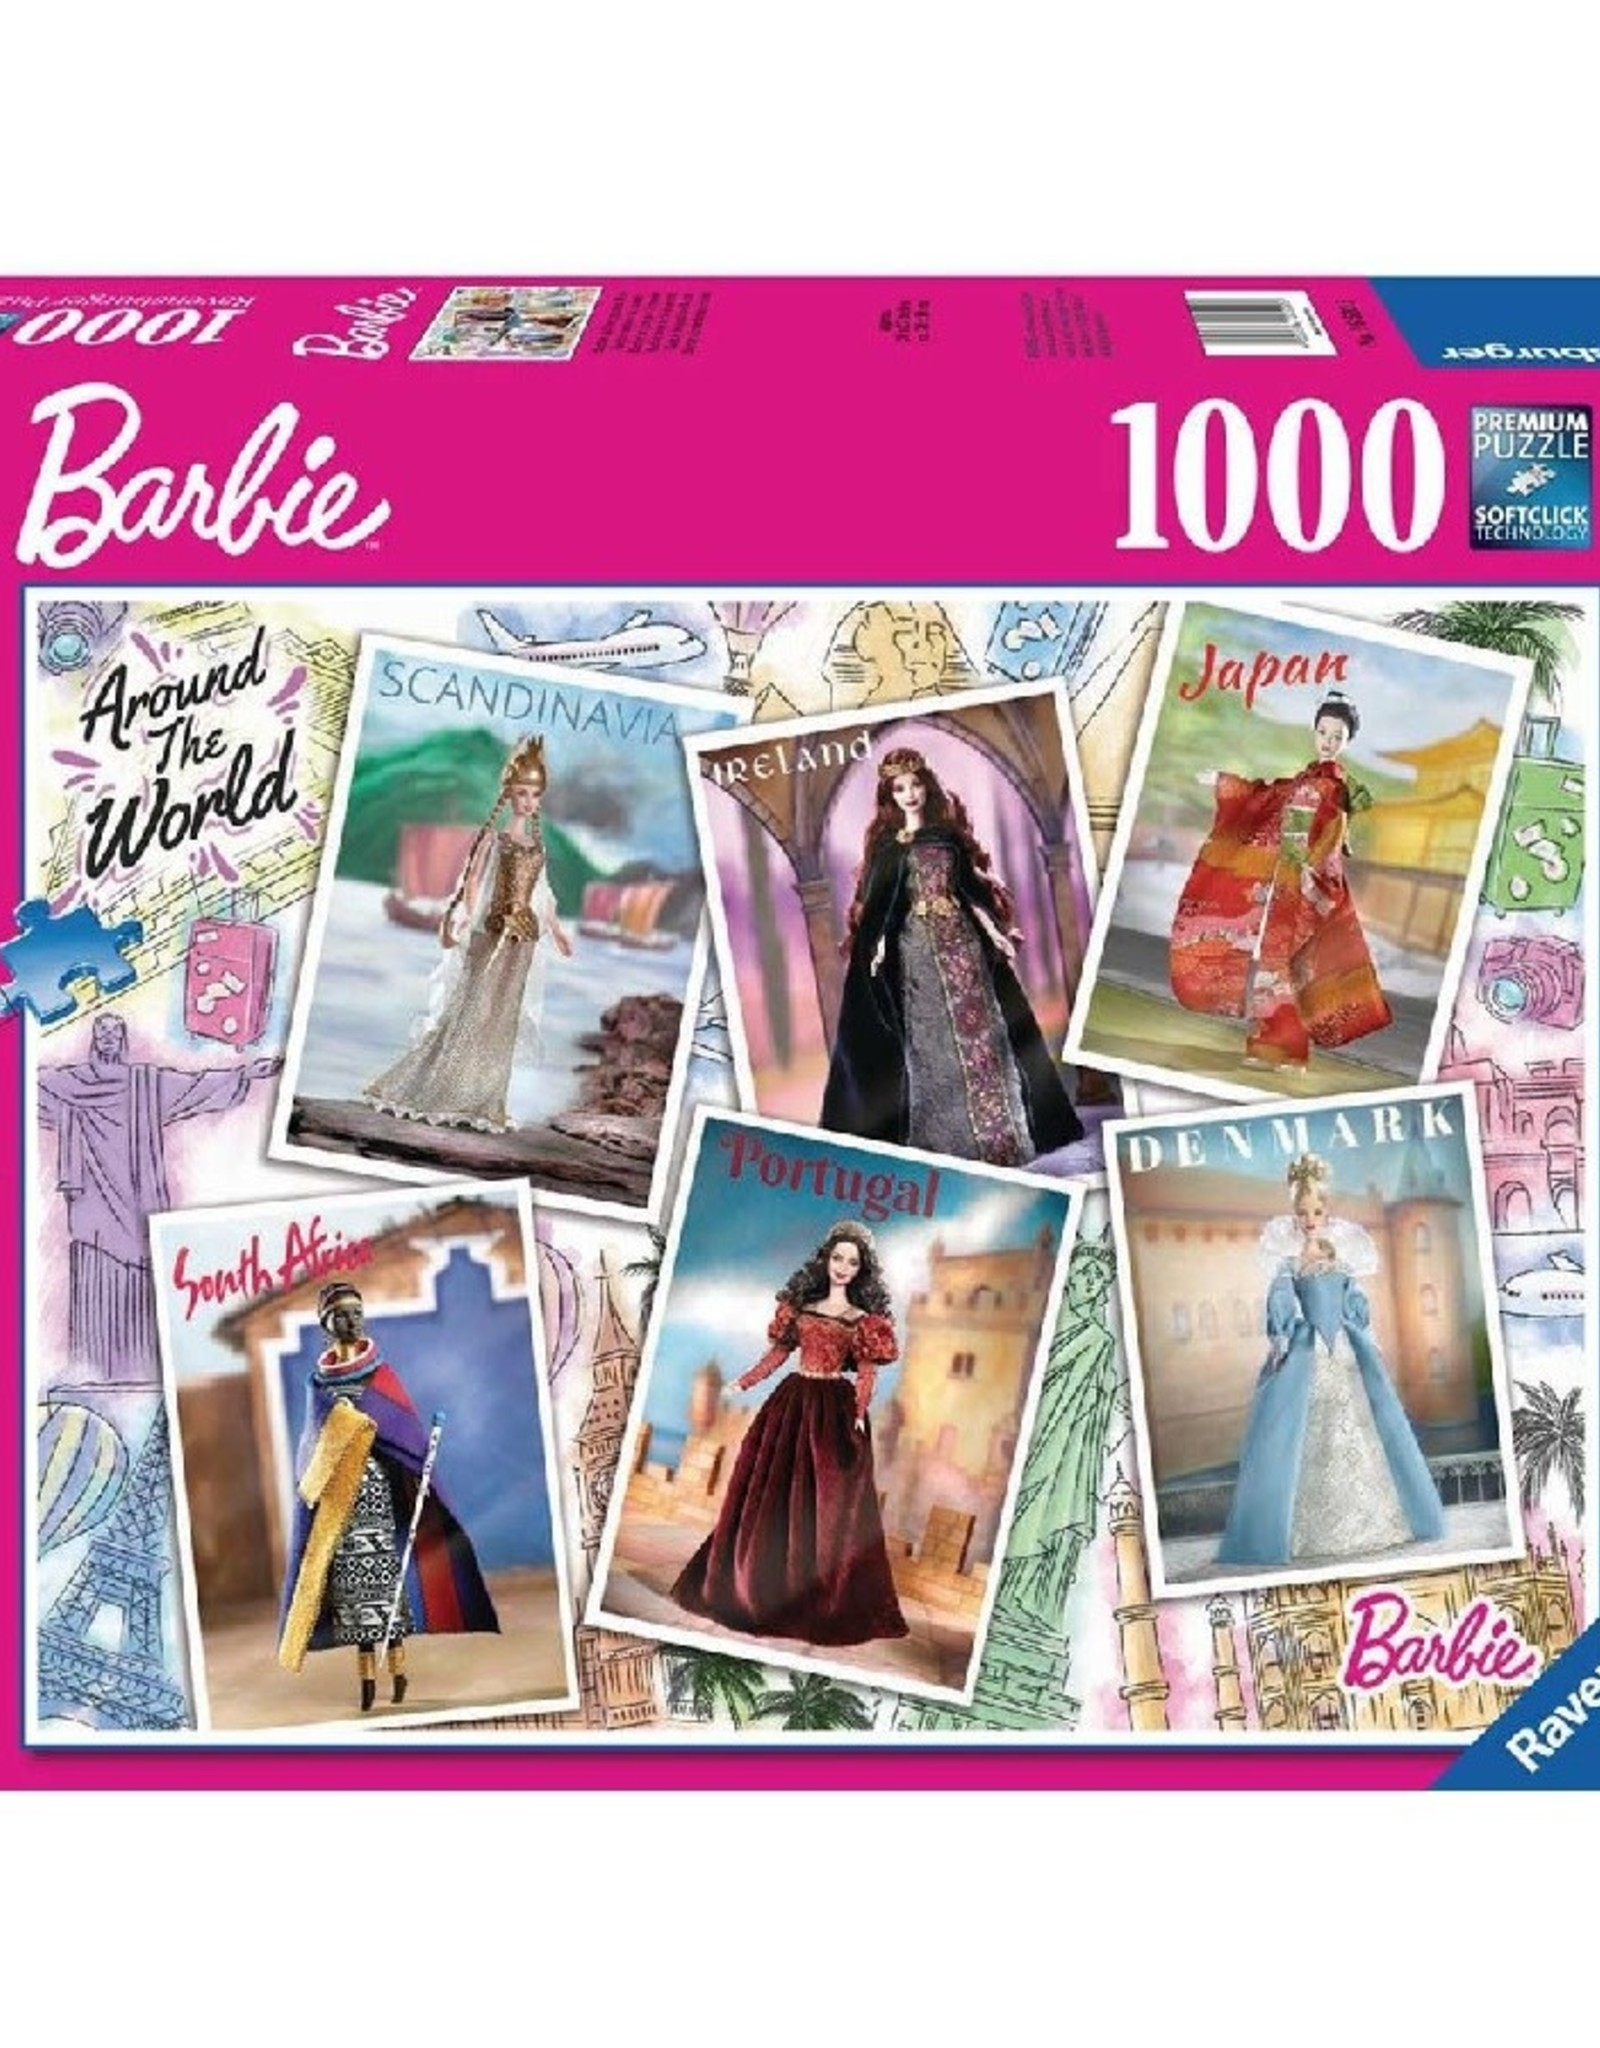 Barbie Around the World  (1000 pc)